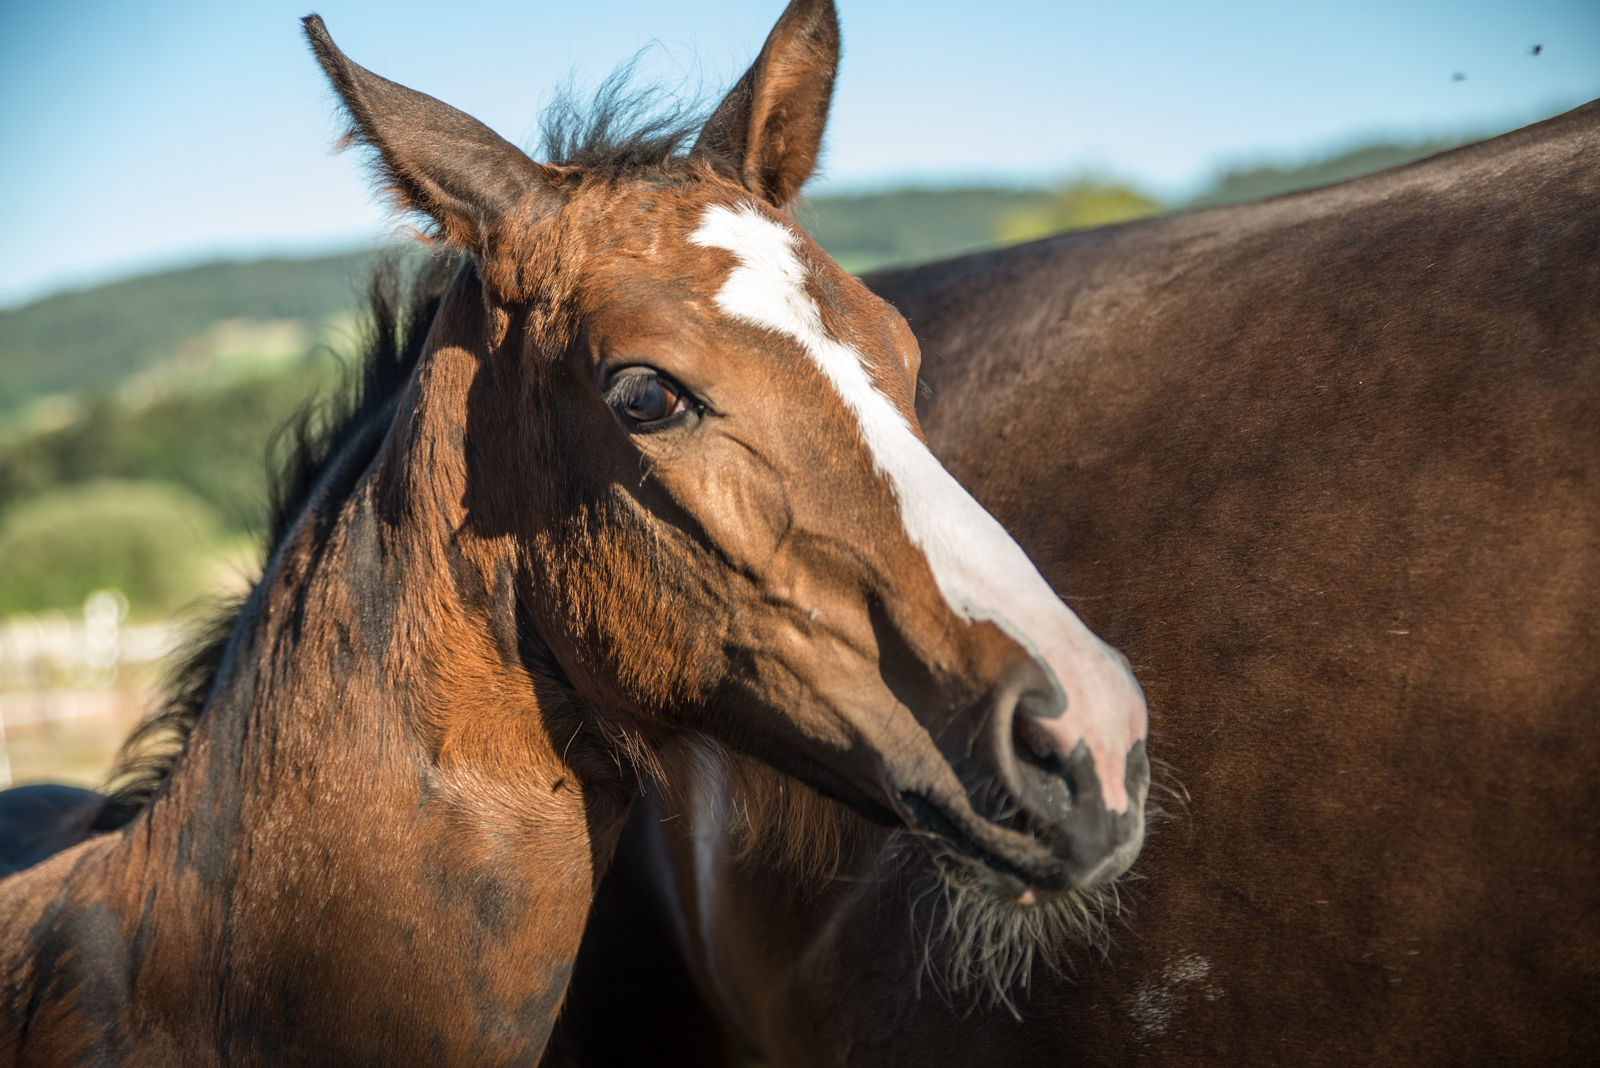 Pferde und Fohlen DUOVet Bern